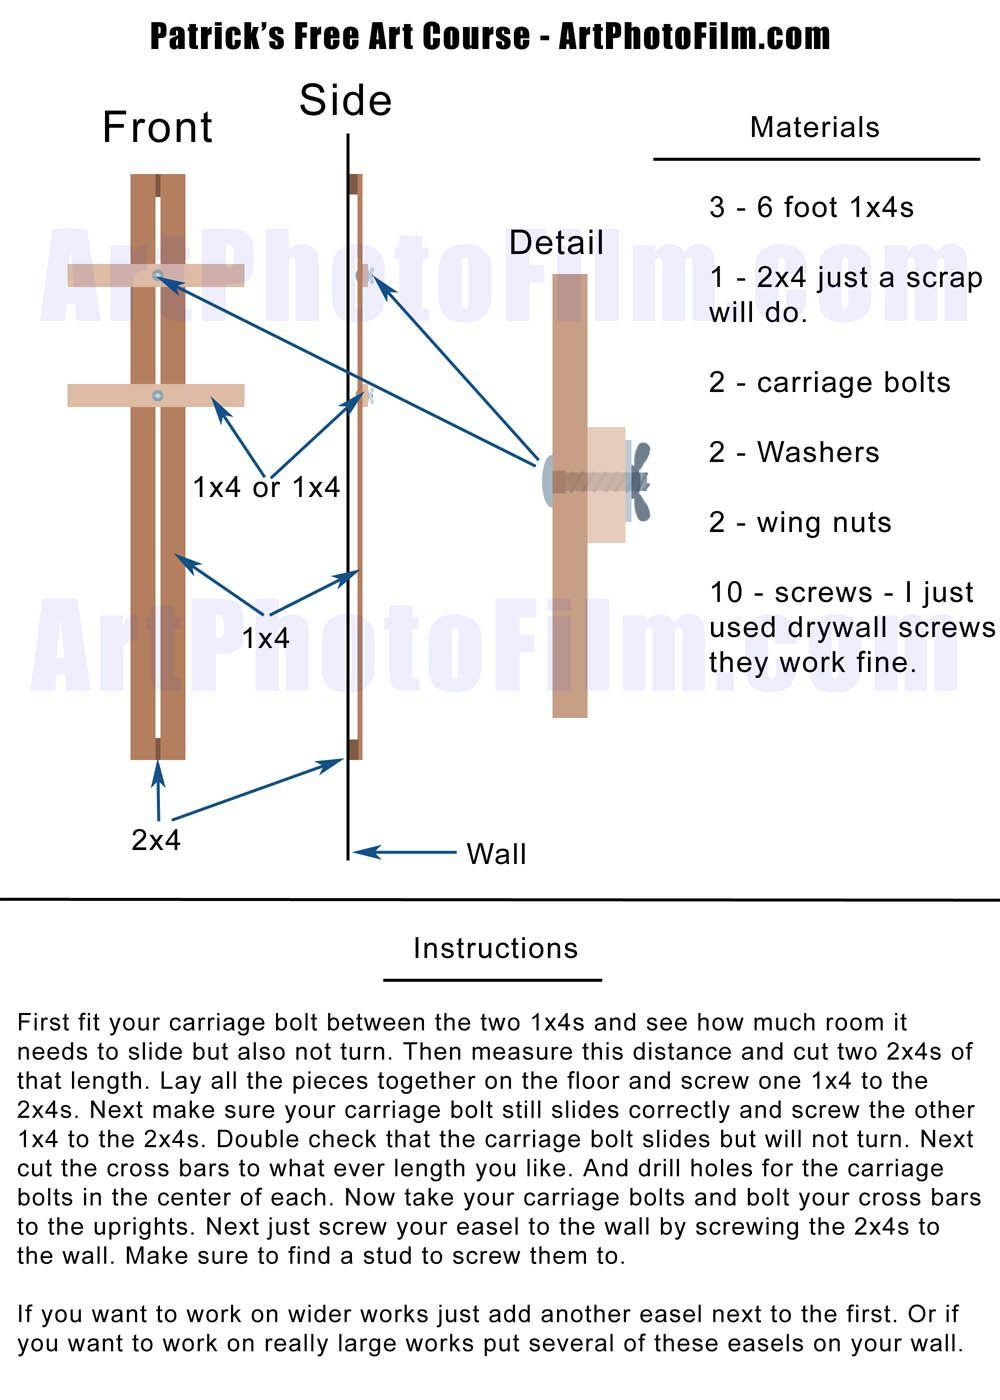 how to make hyperlink works in pdf